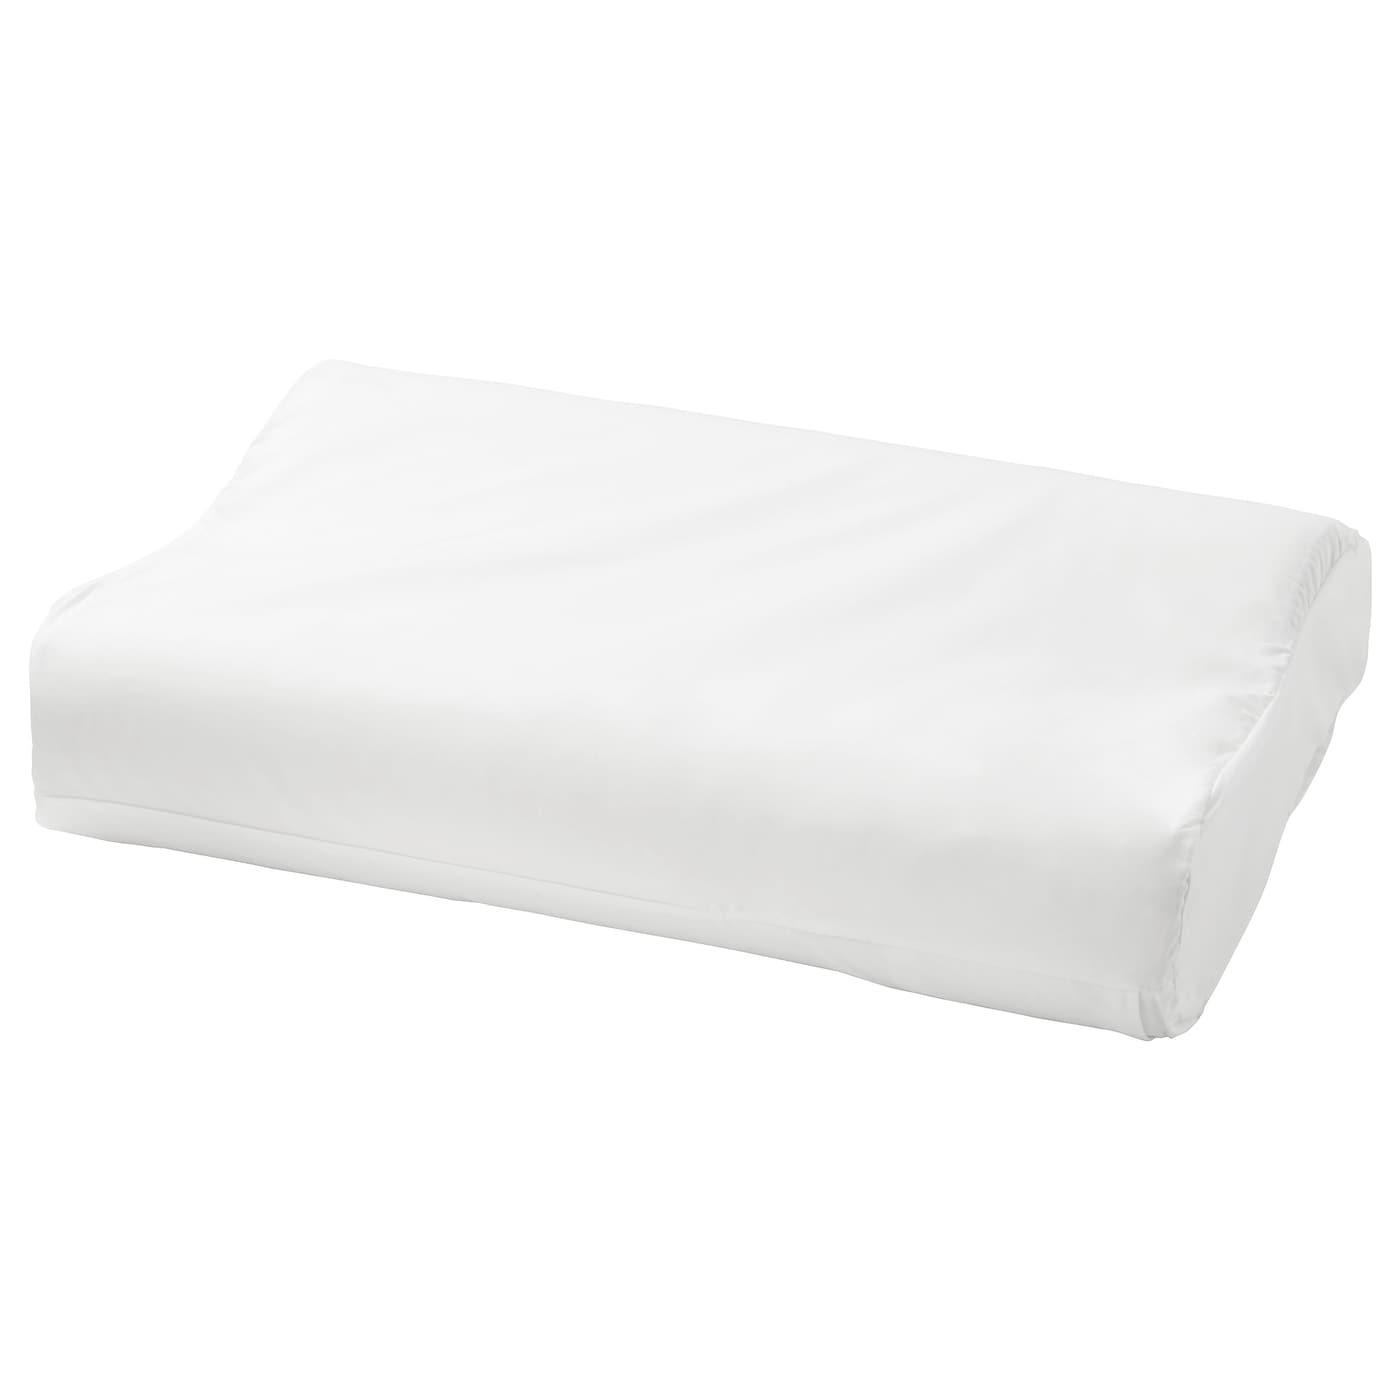 Rosenskarm Federa Per Cuscino Ergonomico Bianco 33x50 Cm Ikea Svizzera